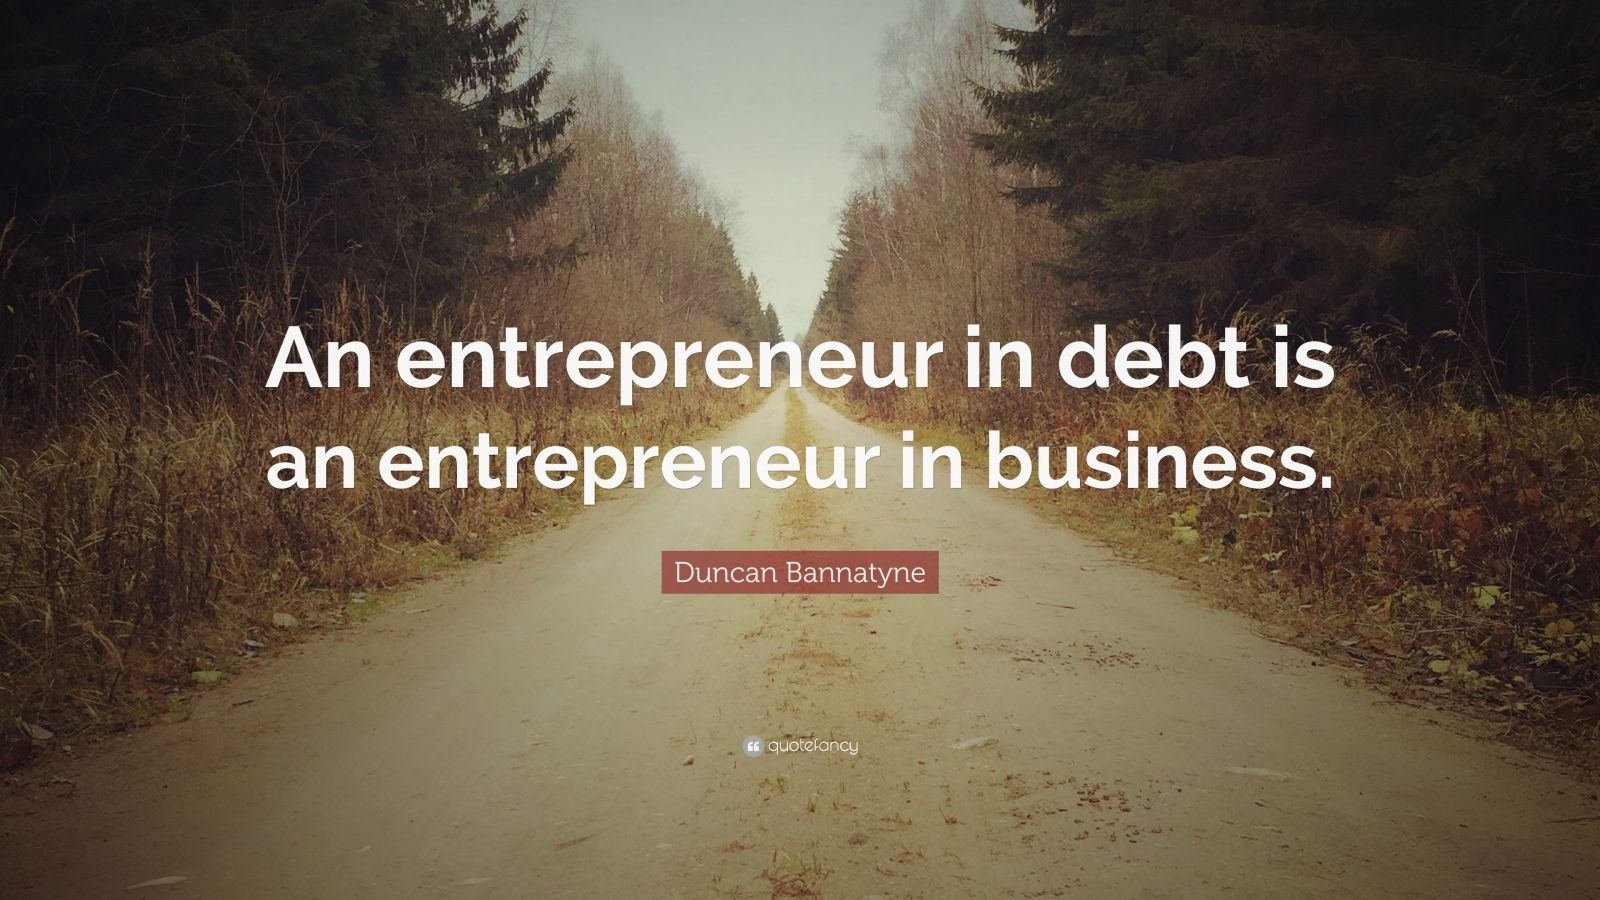 Duncan bannatyne quotes 8 wallpapers quotefancy - Entrepreneur wallpaper ...